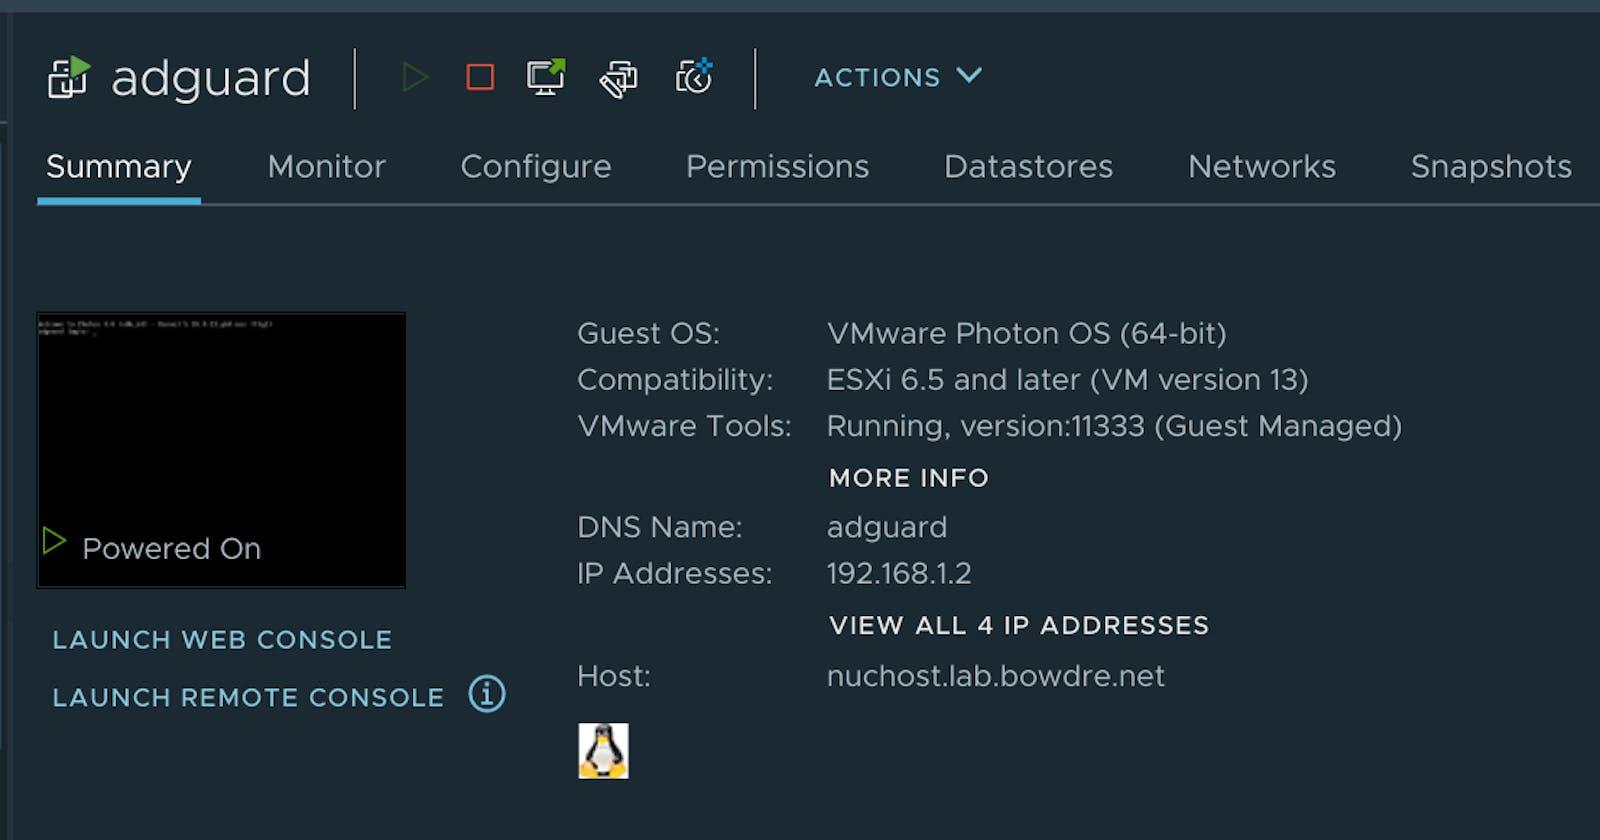 AdGuard Home in Docker on Photon OS